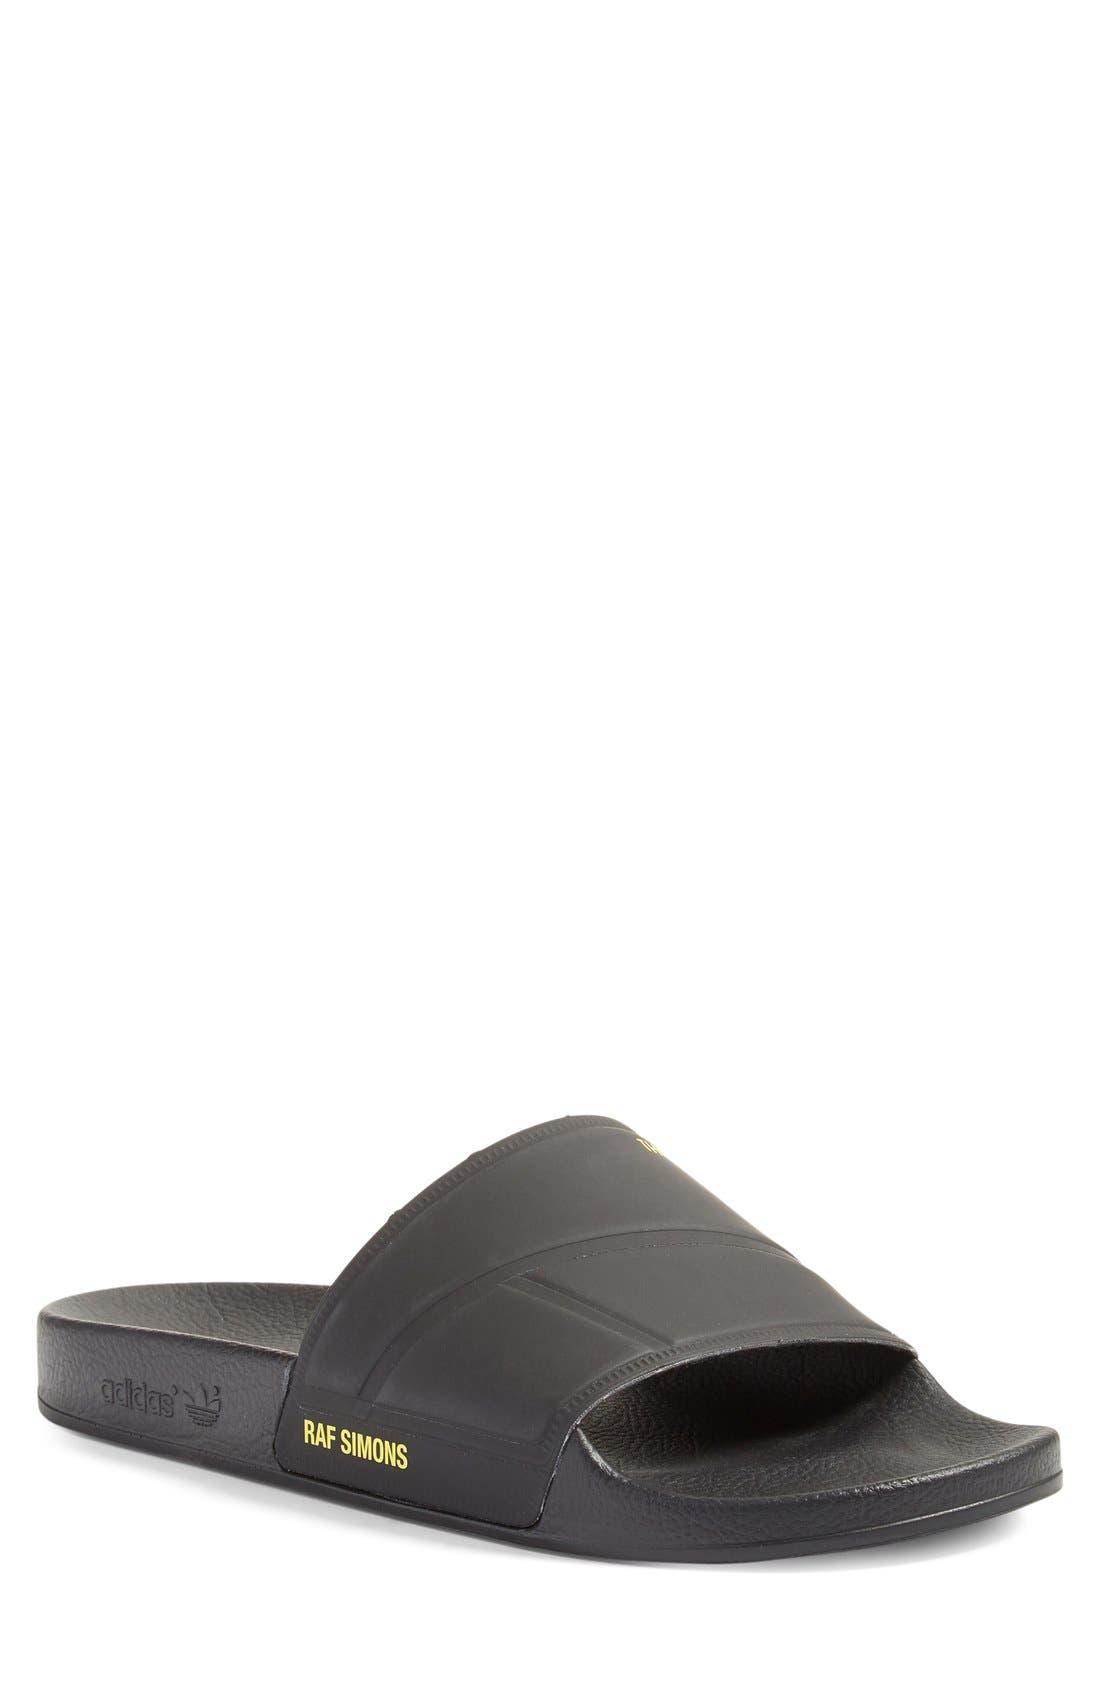 adidas by Raf Simons Bunny Adilette Slide Sandal,                             Main thumbnail 1, color,                             001